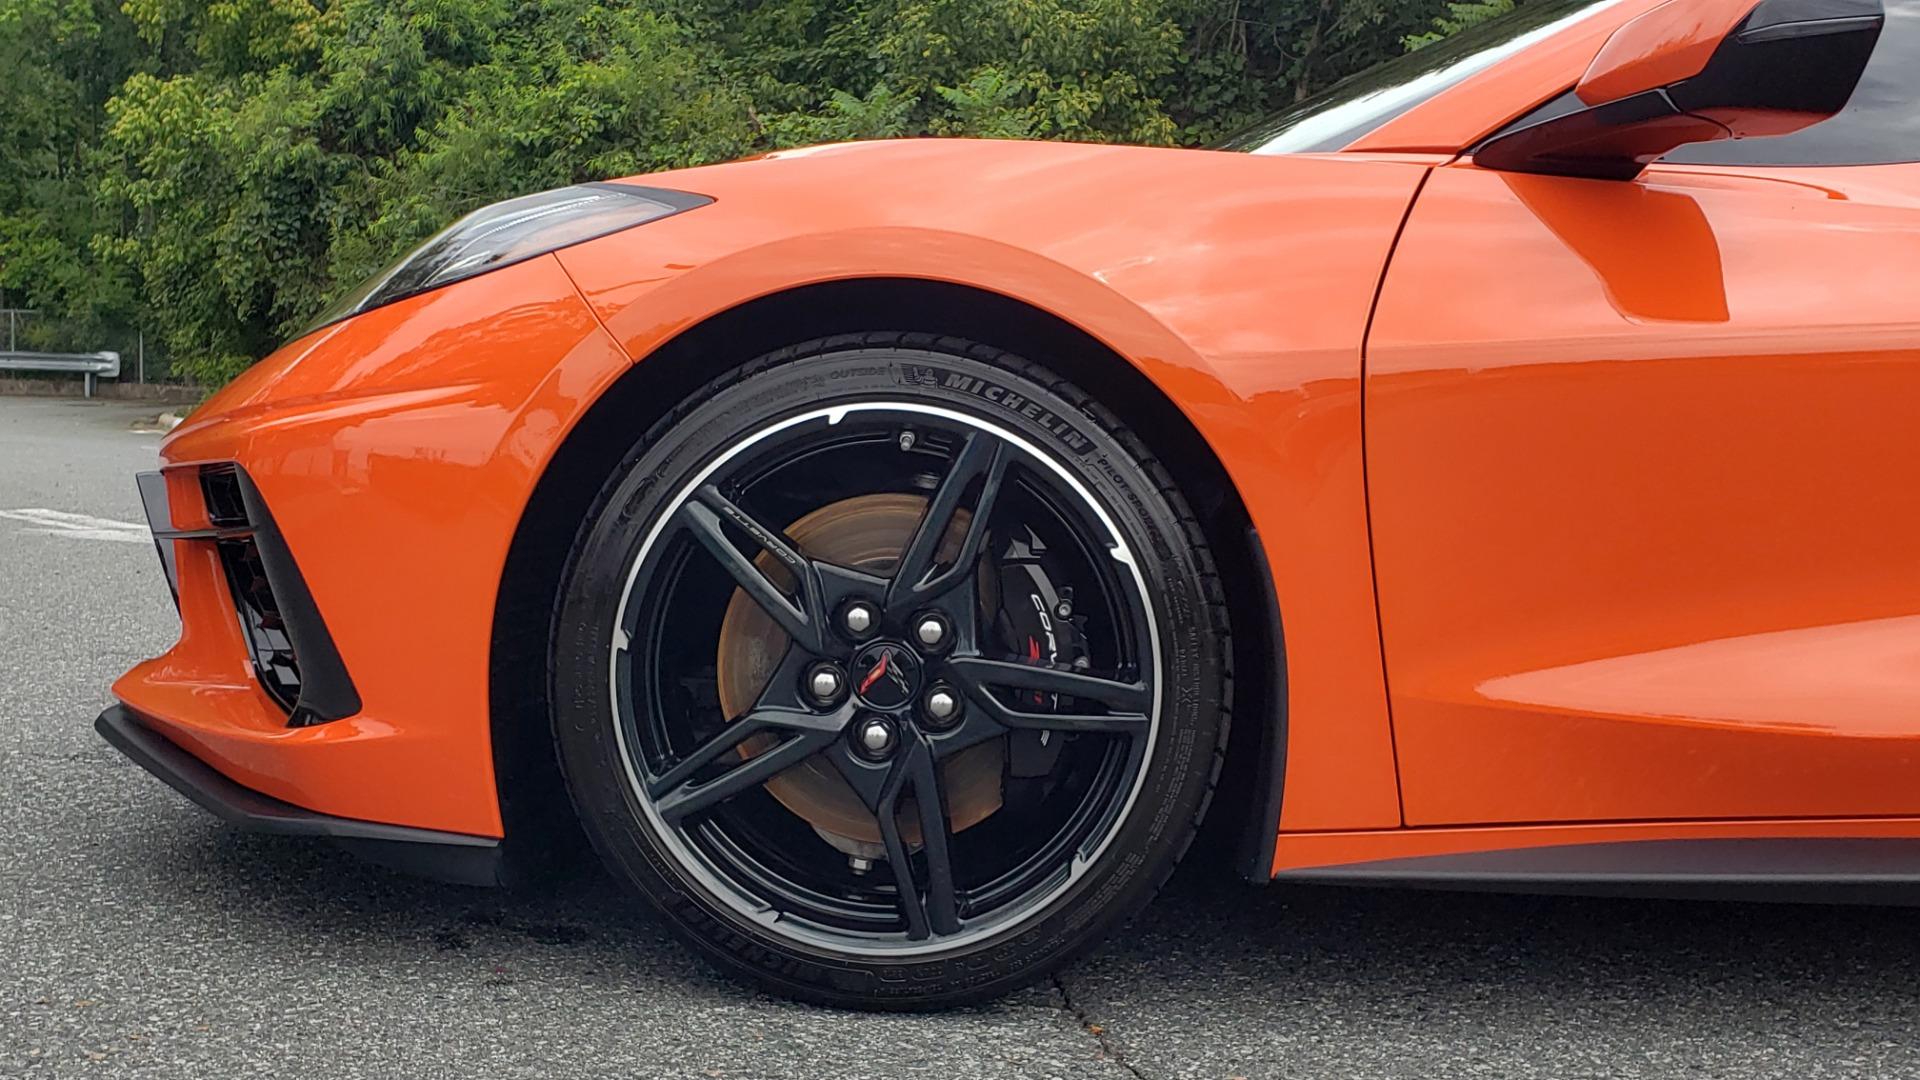 Used 2020 Chevrolet CORVETTE C8 STINGRAY 2LT / 6.2L V8 / 8-SPD AUTO / NAV / BOSE / REARVIEW / DATA RECOR for sale Sold at Formula Imports in Charlotte NC 28227 83